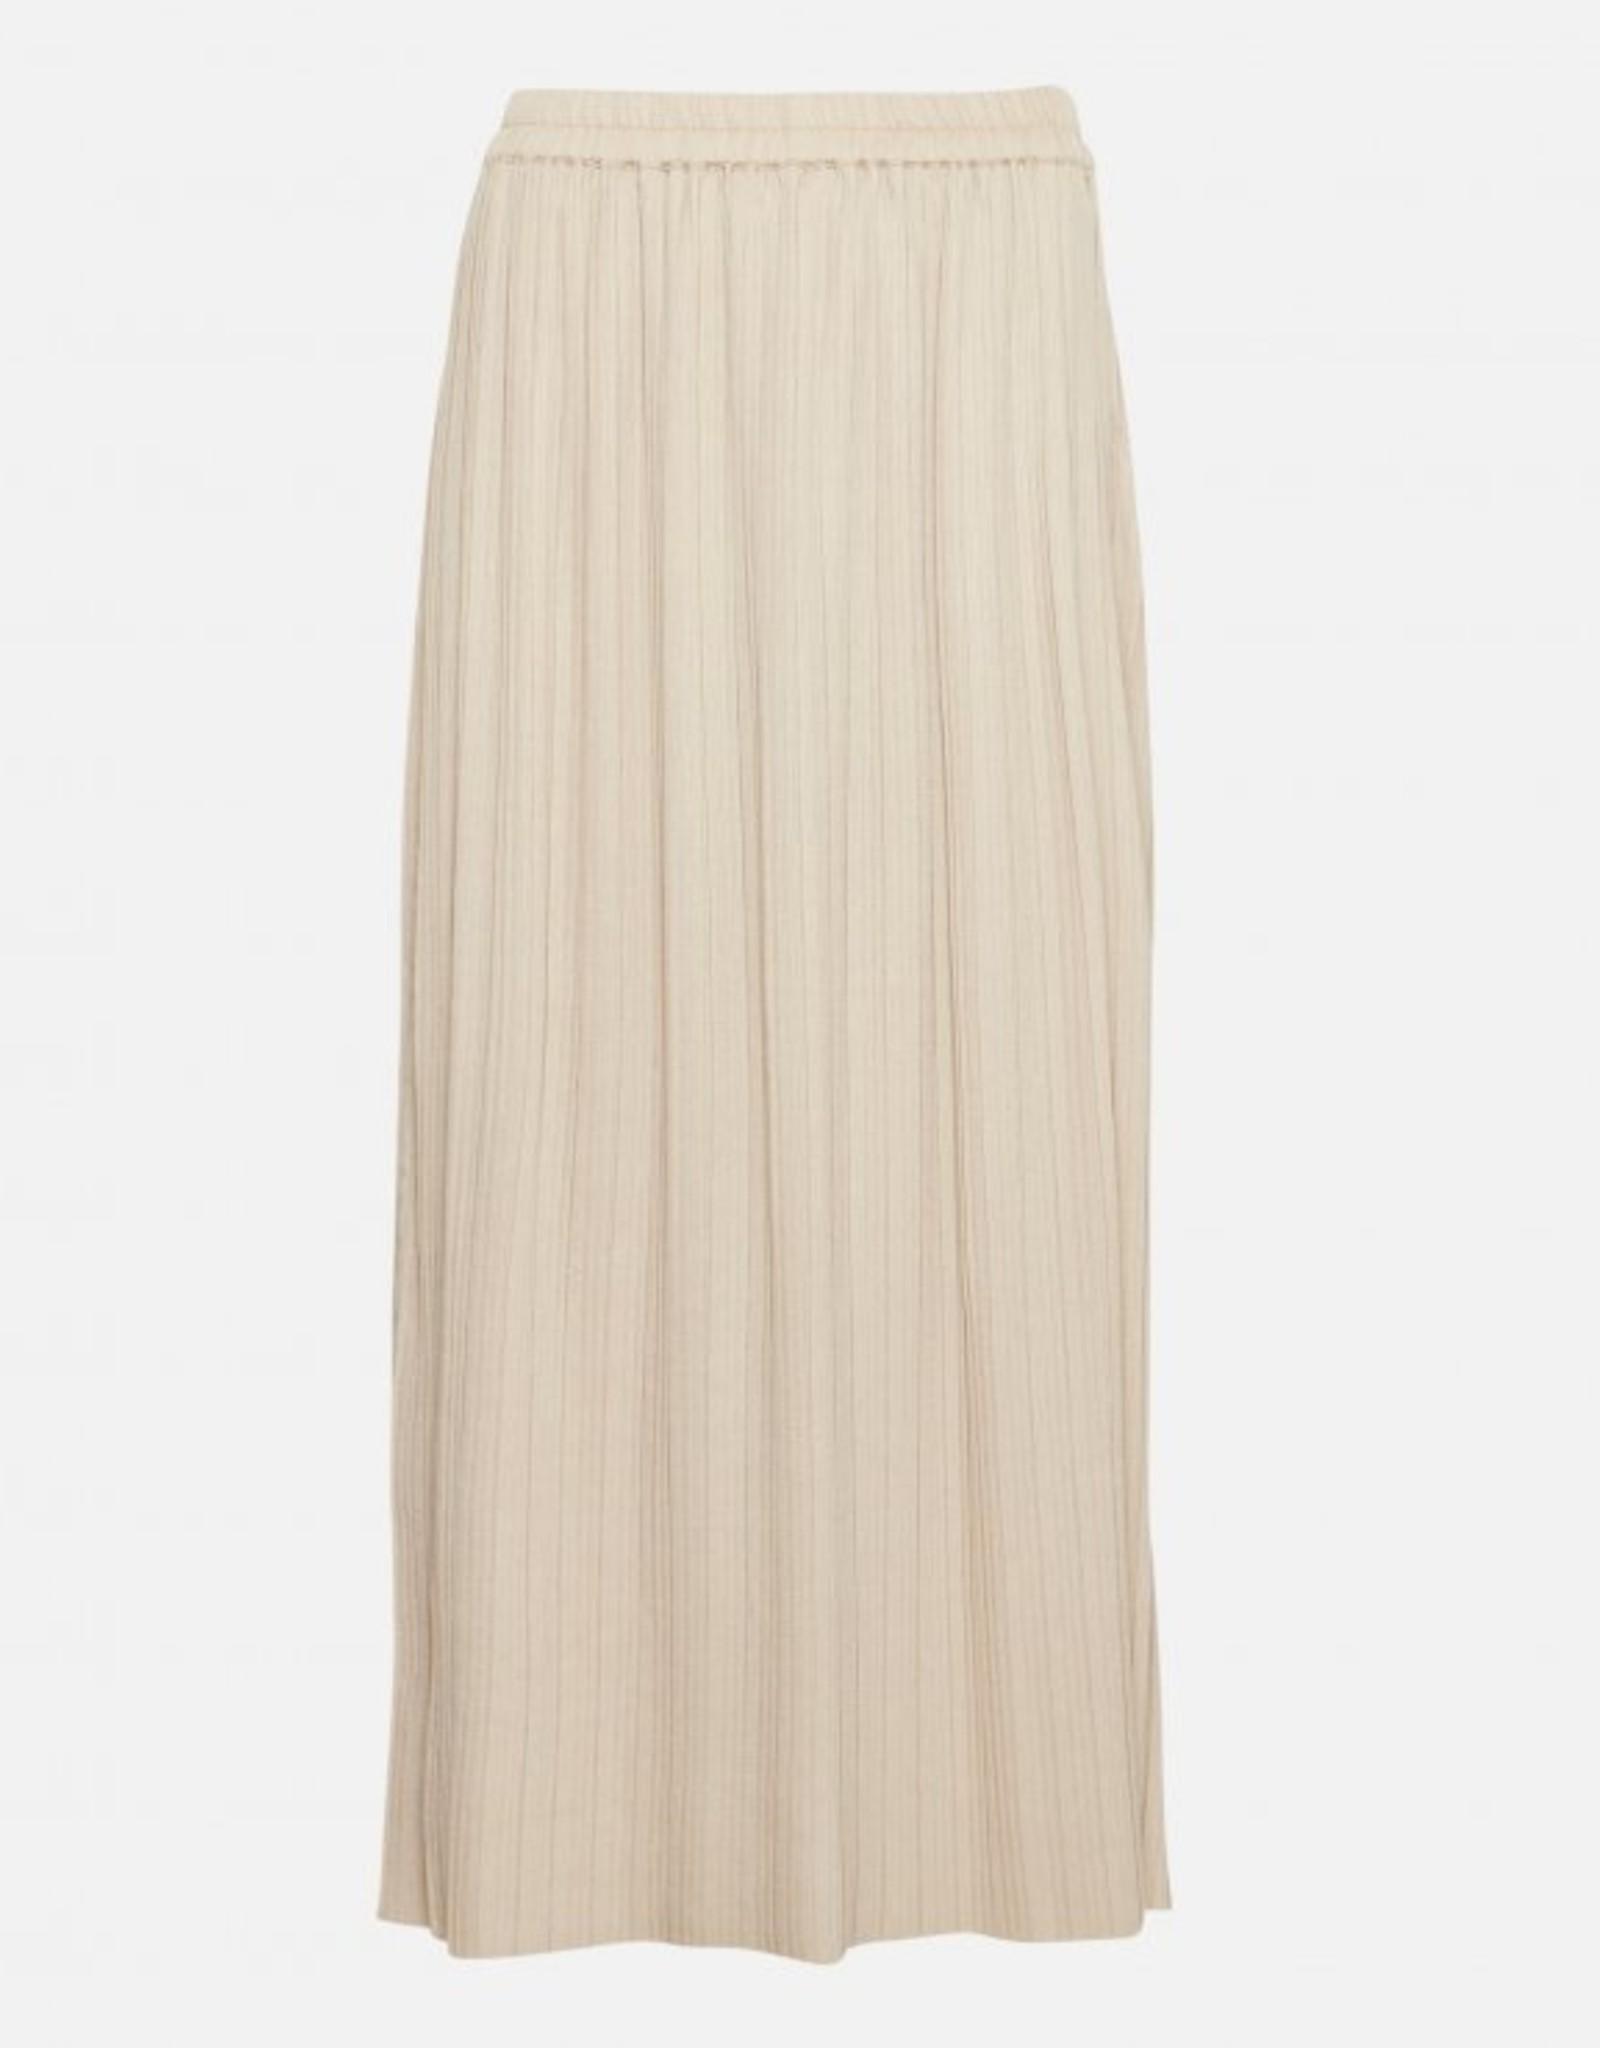 Moss Copenhagen Novea Skirt Wood Ash